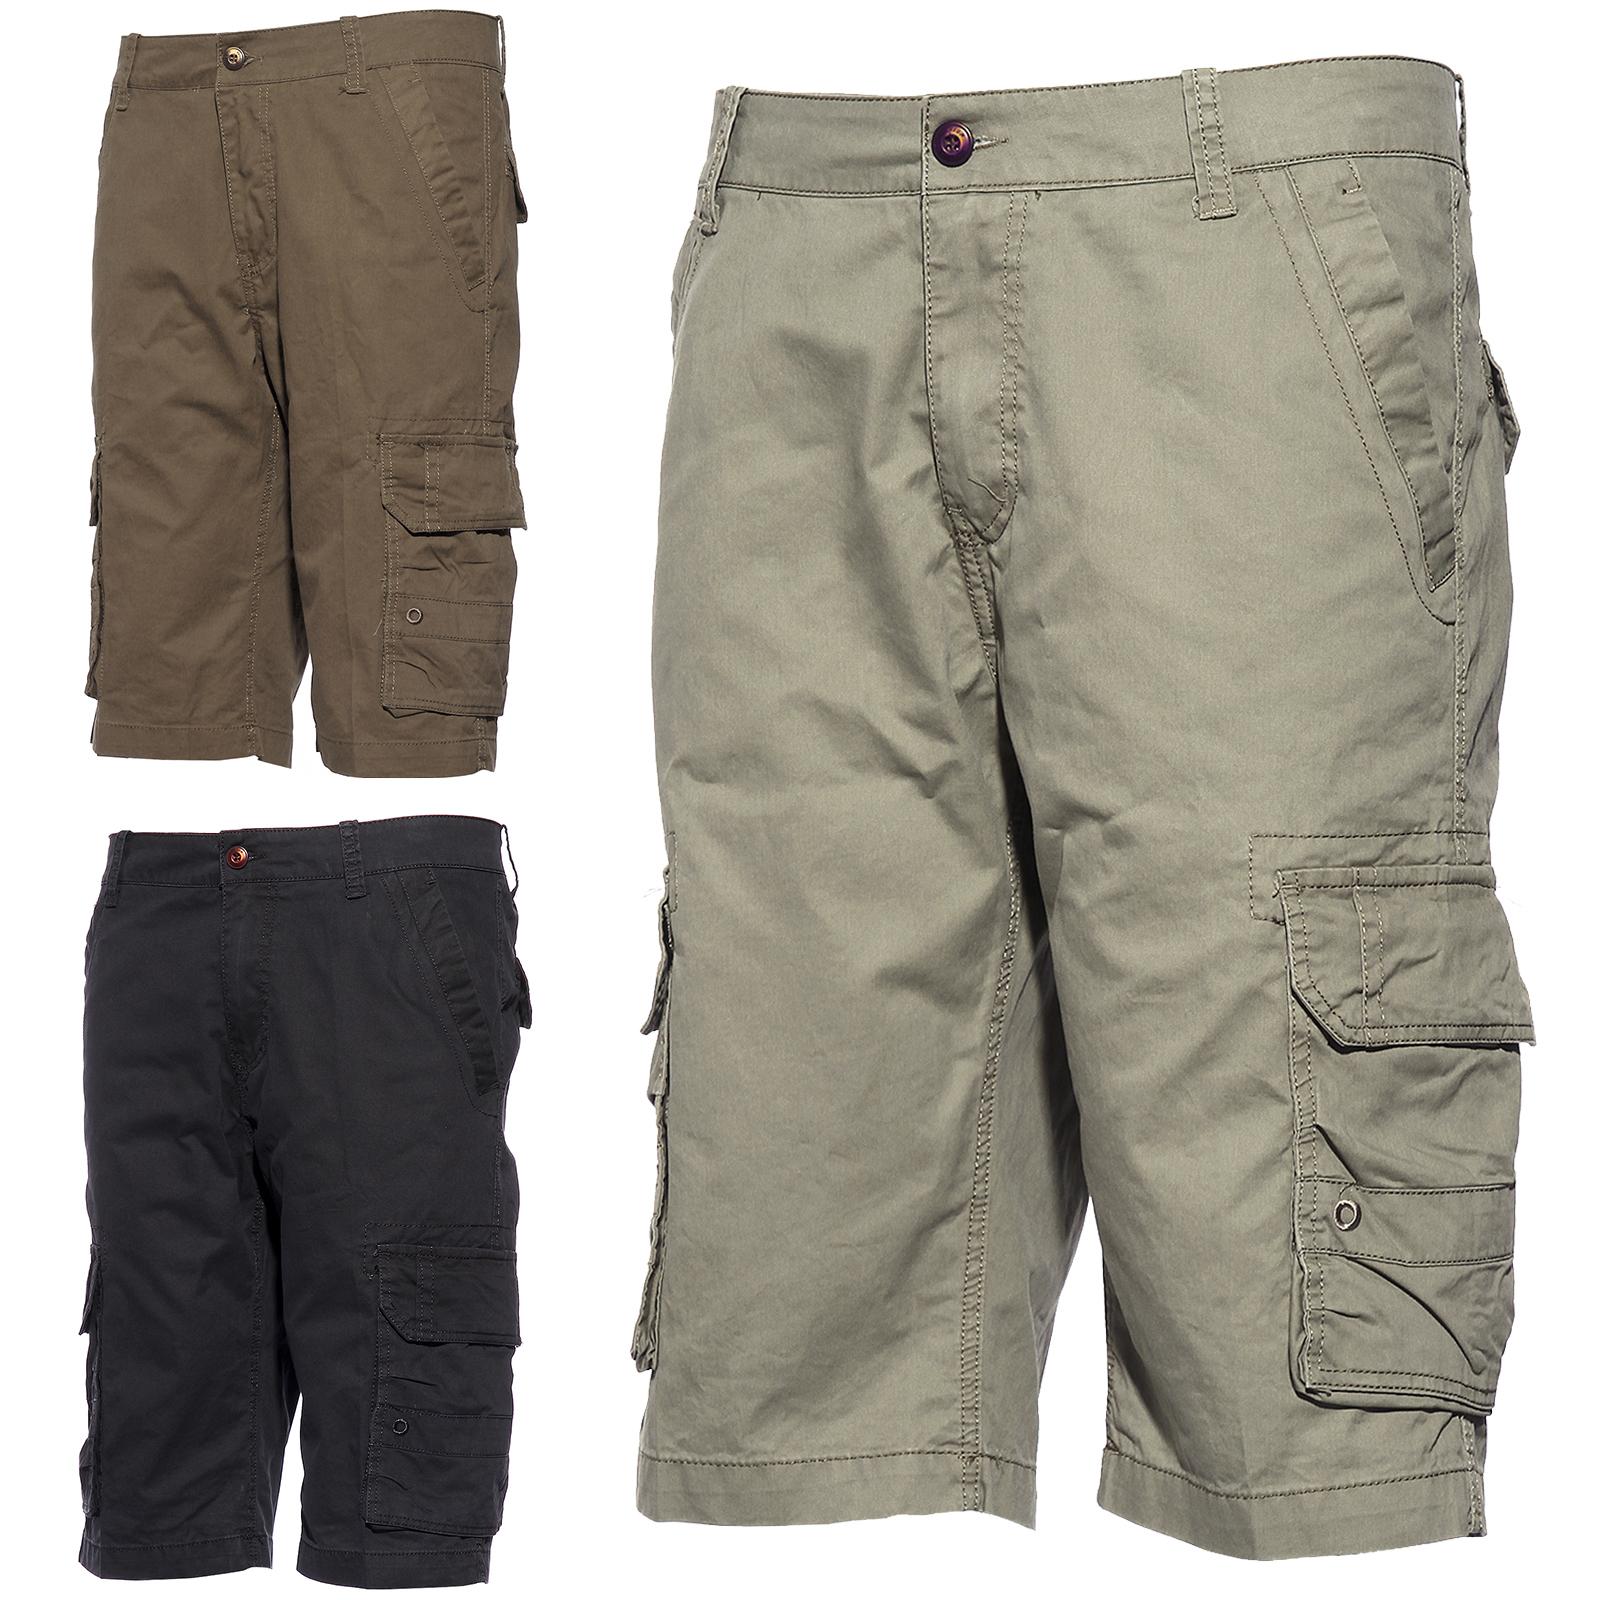 bermuda pantalon short pant pantacourt cargo homme plage style 2 3couleur taille ebay. Black Bedroom Furniture Sets. Home Design Ideas